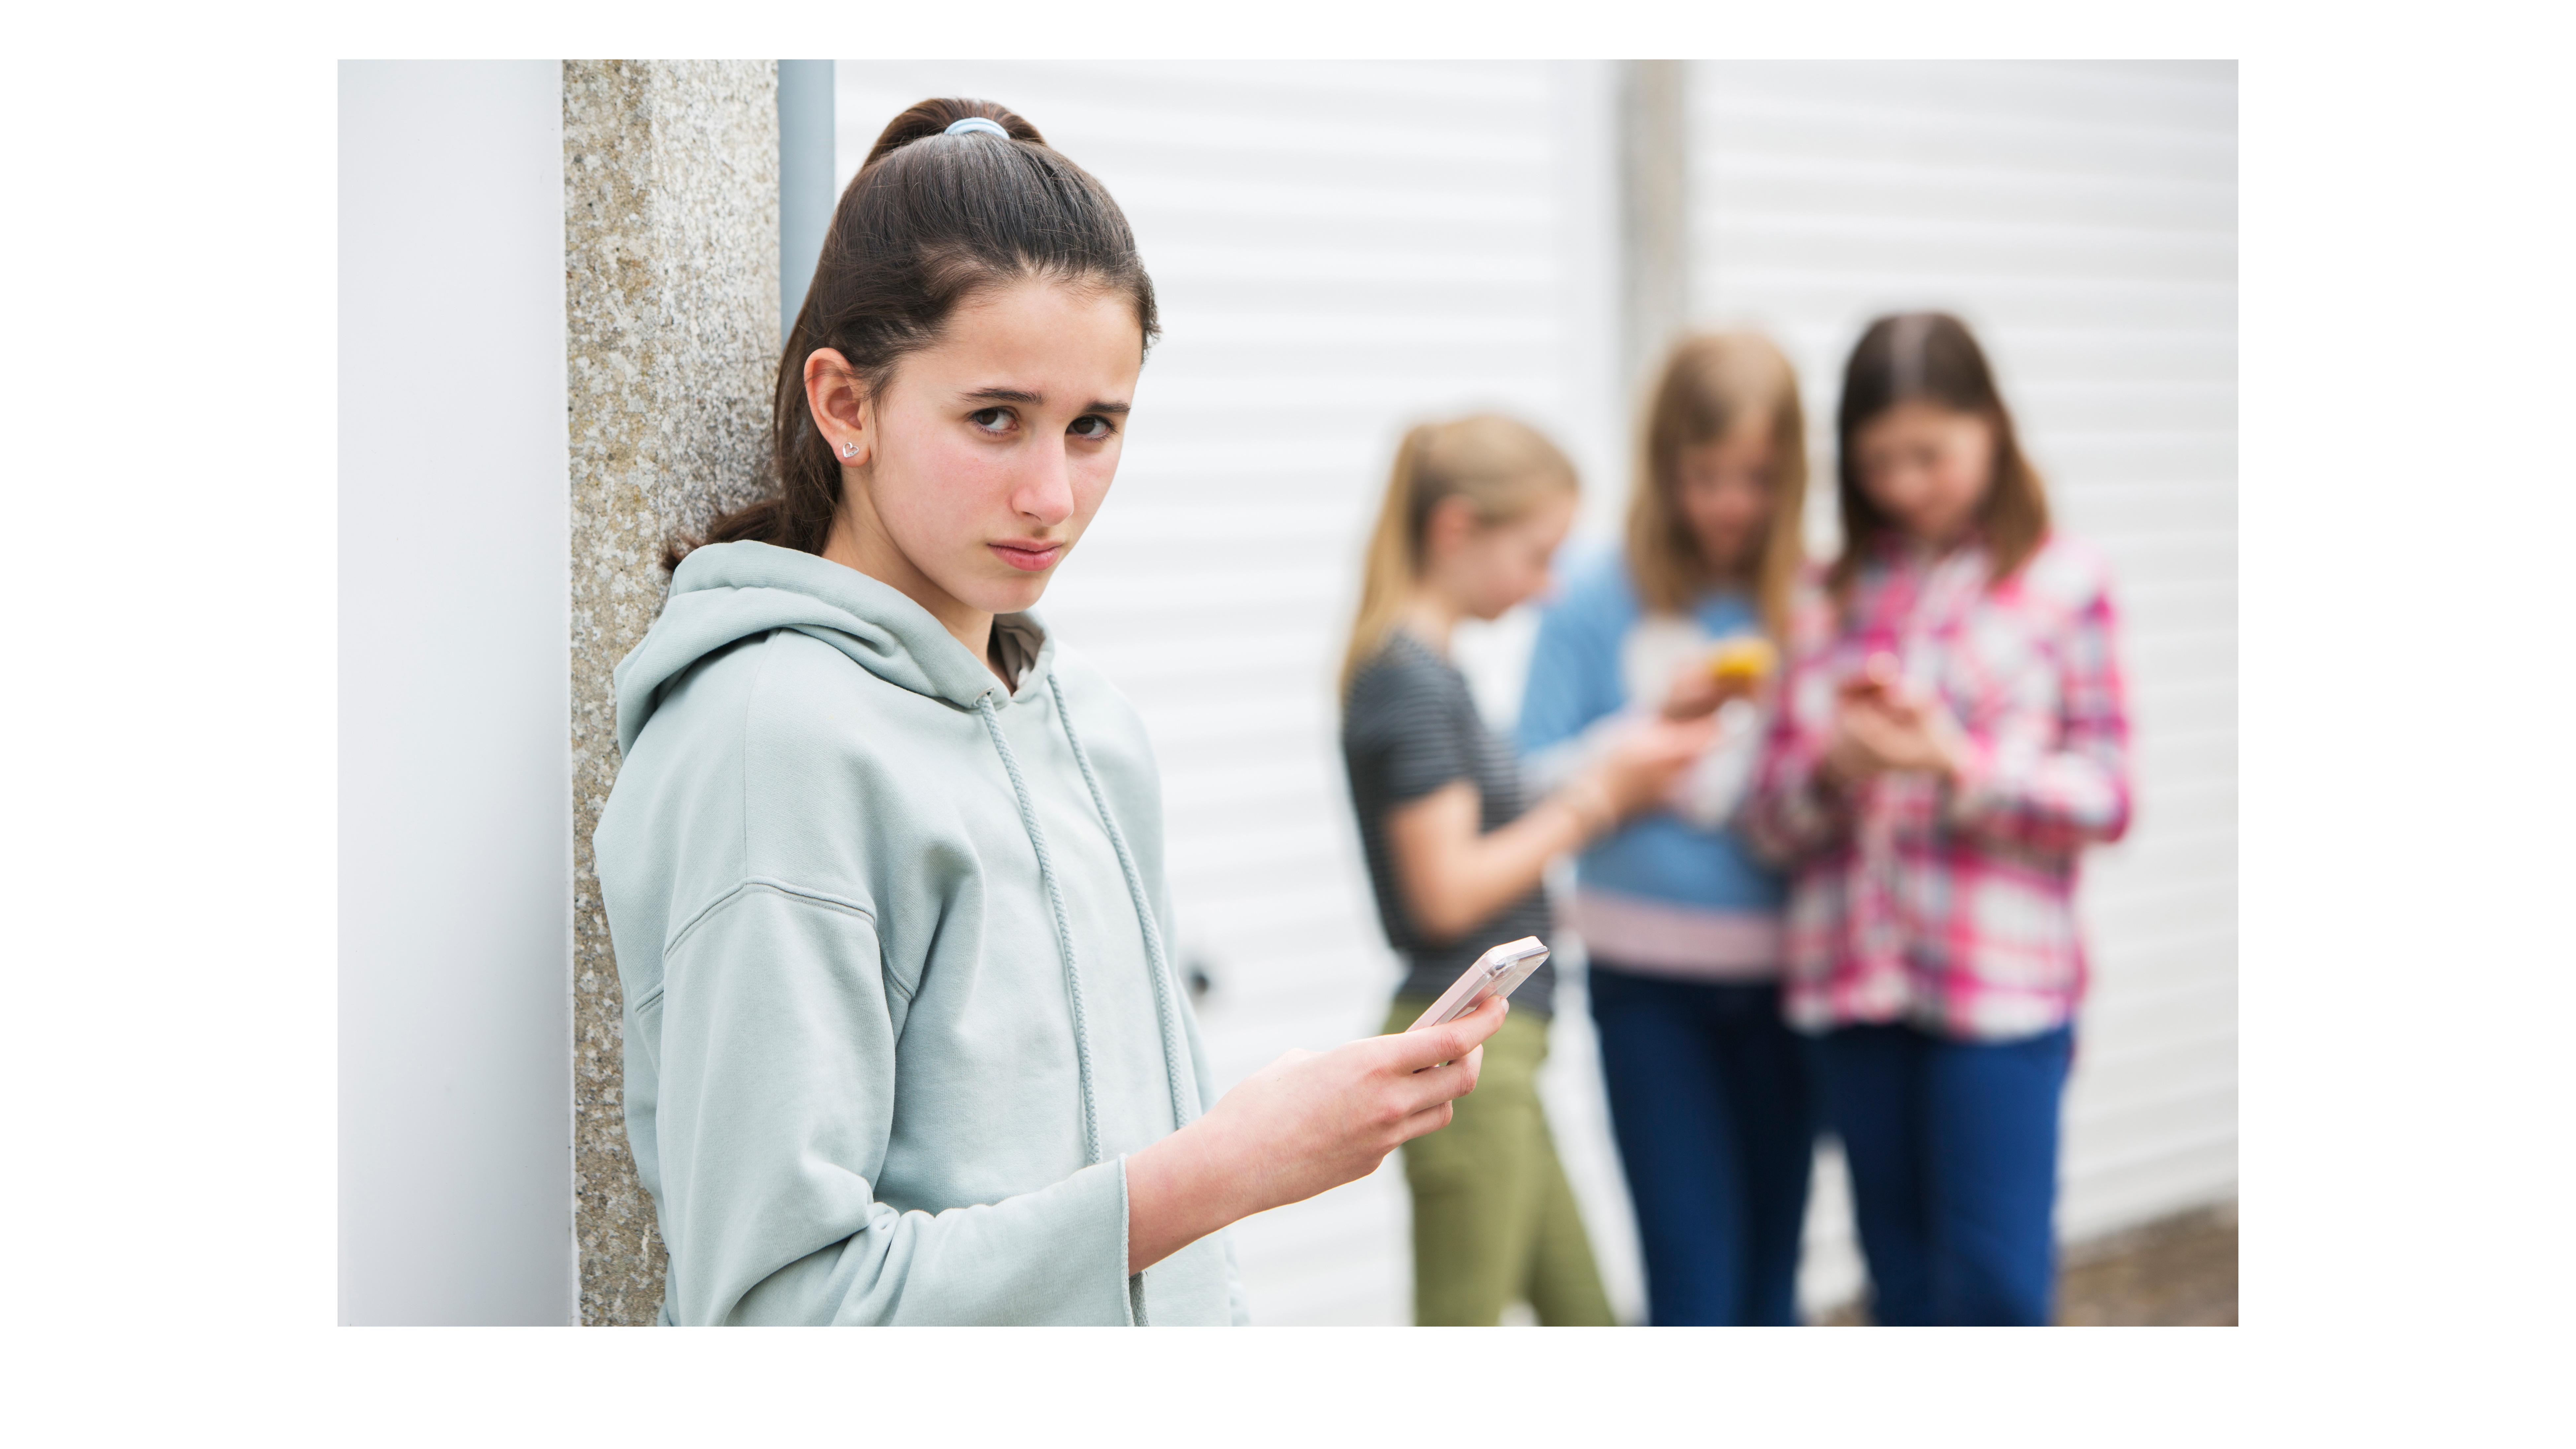 Teen young adult mental health topeka man rapping